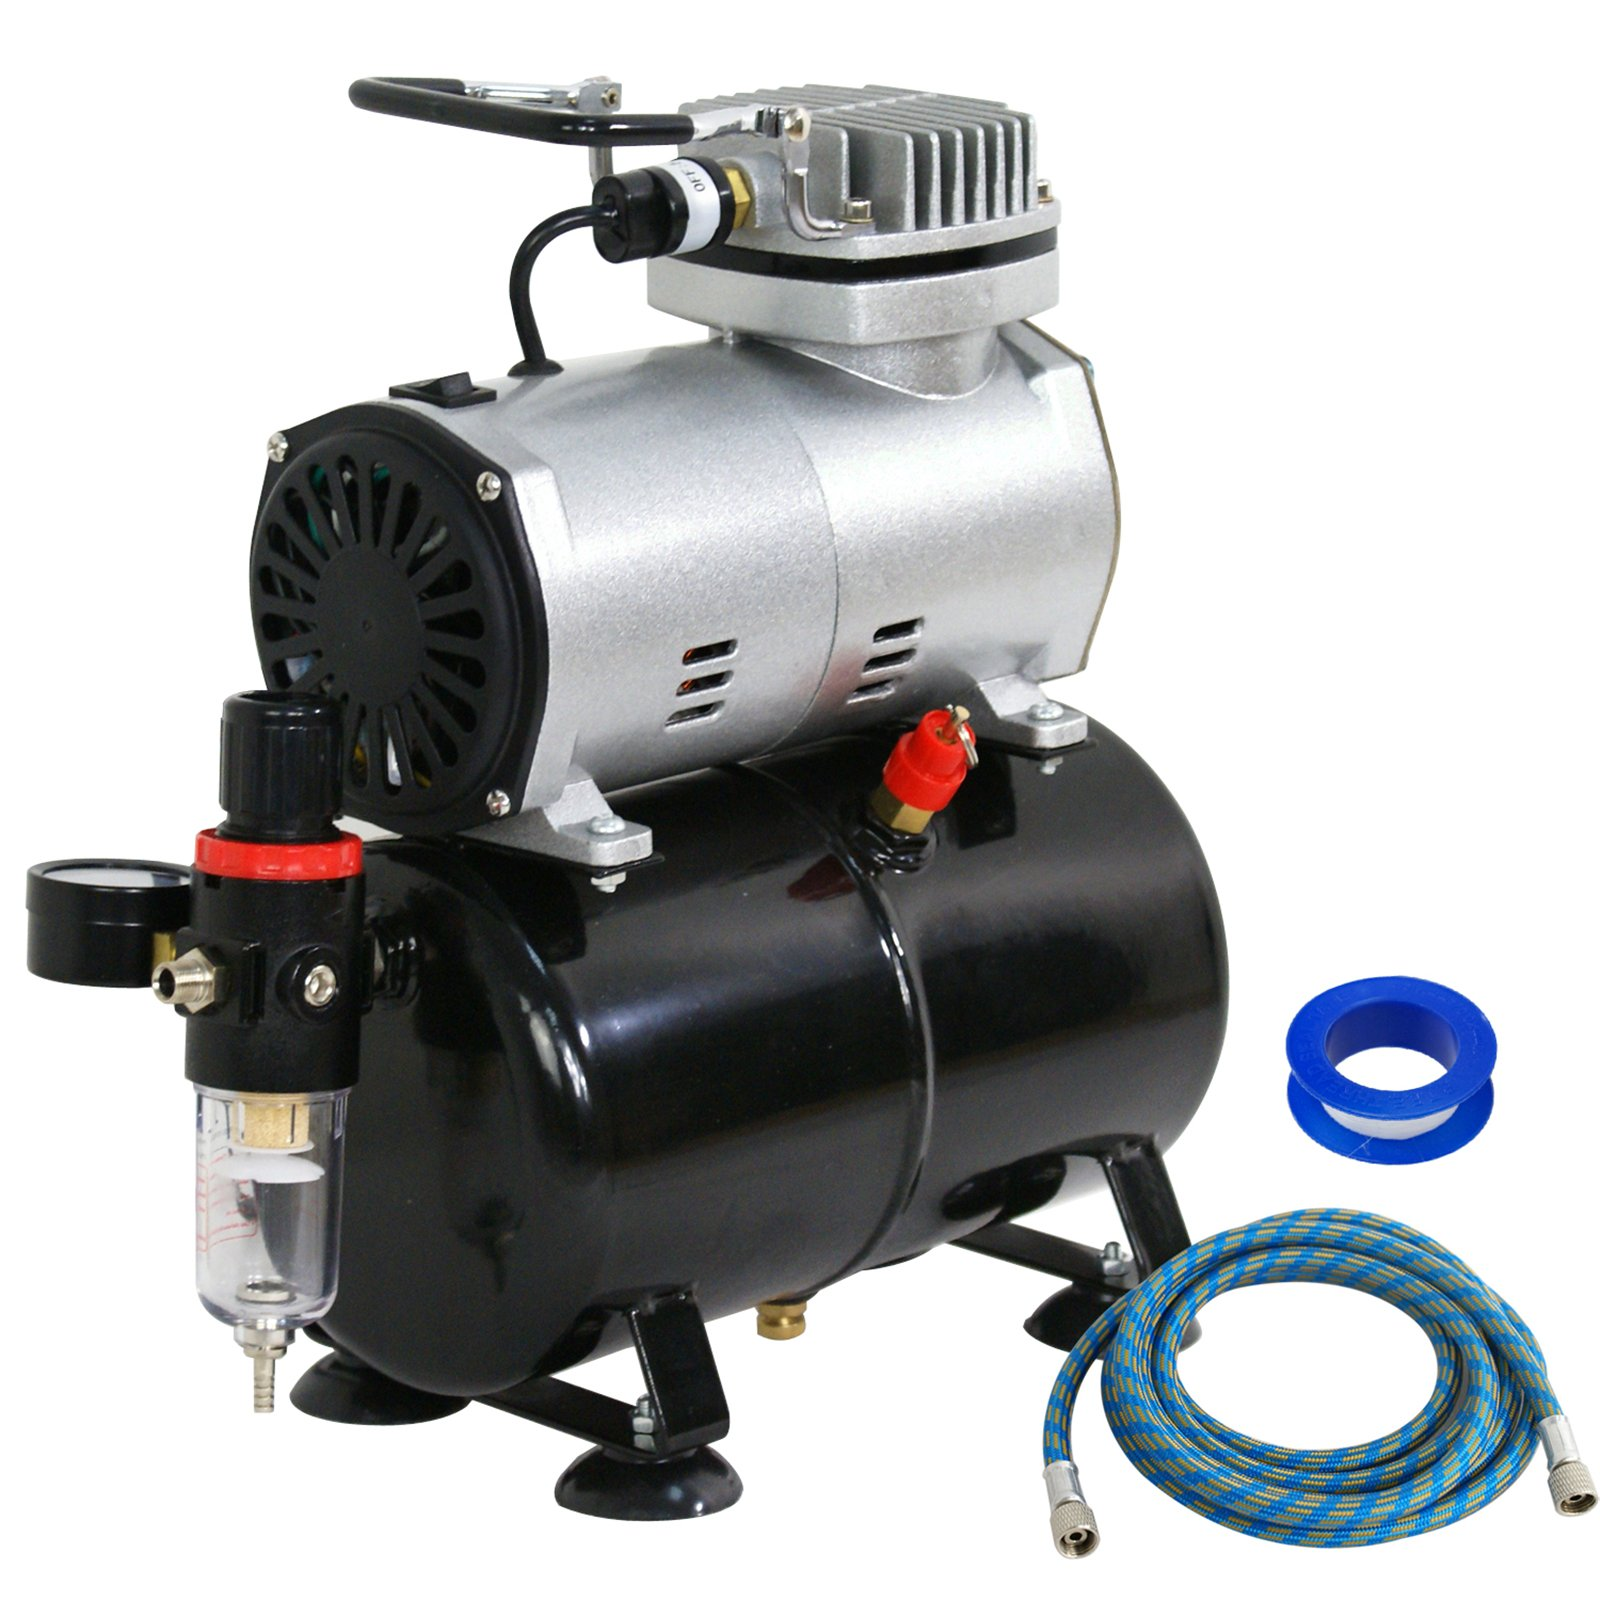 F2C TC-20T 1/5HP Pro Air Compressor Airbrush Kits W/ 6FT Hose and 3L Tank by F2C